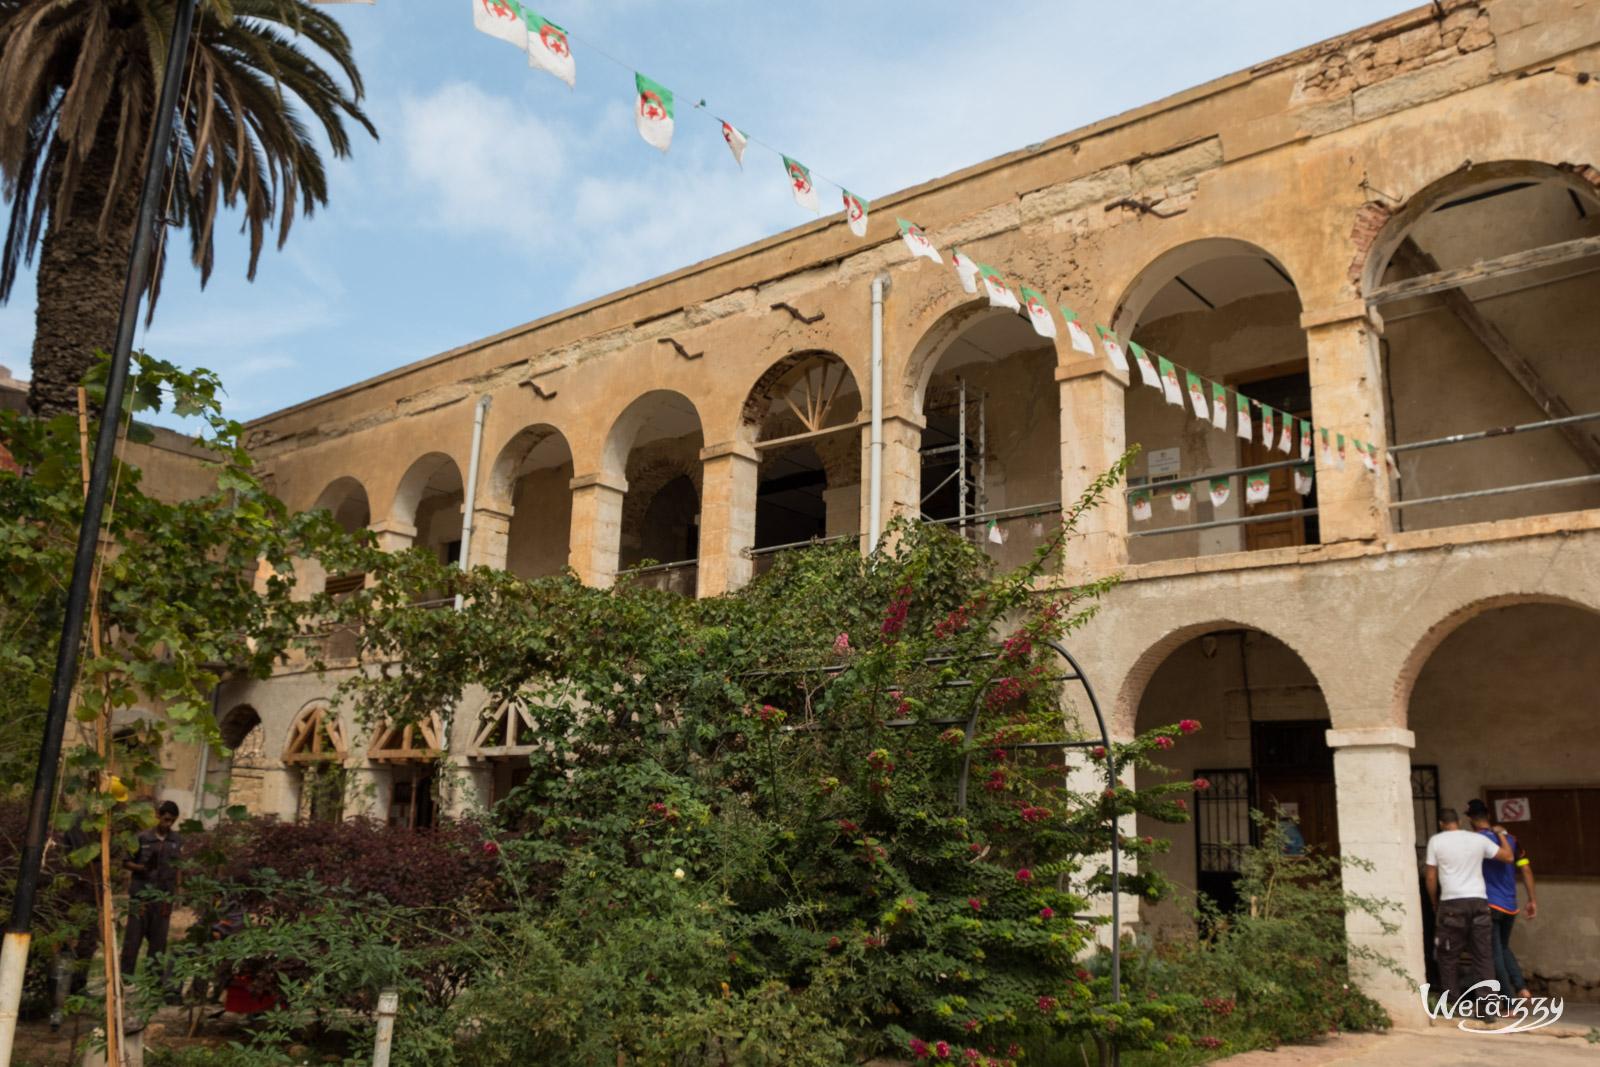 Algérie, Oran, Sidi Al Houari, Voyage